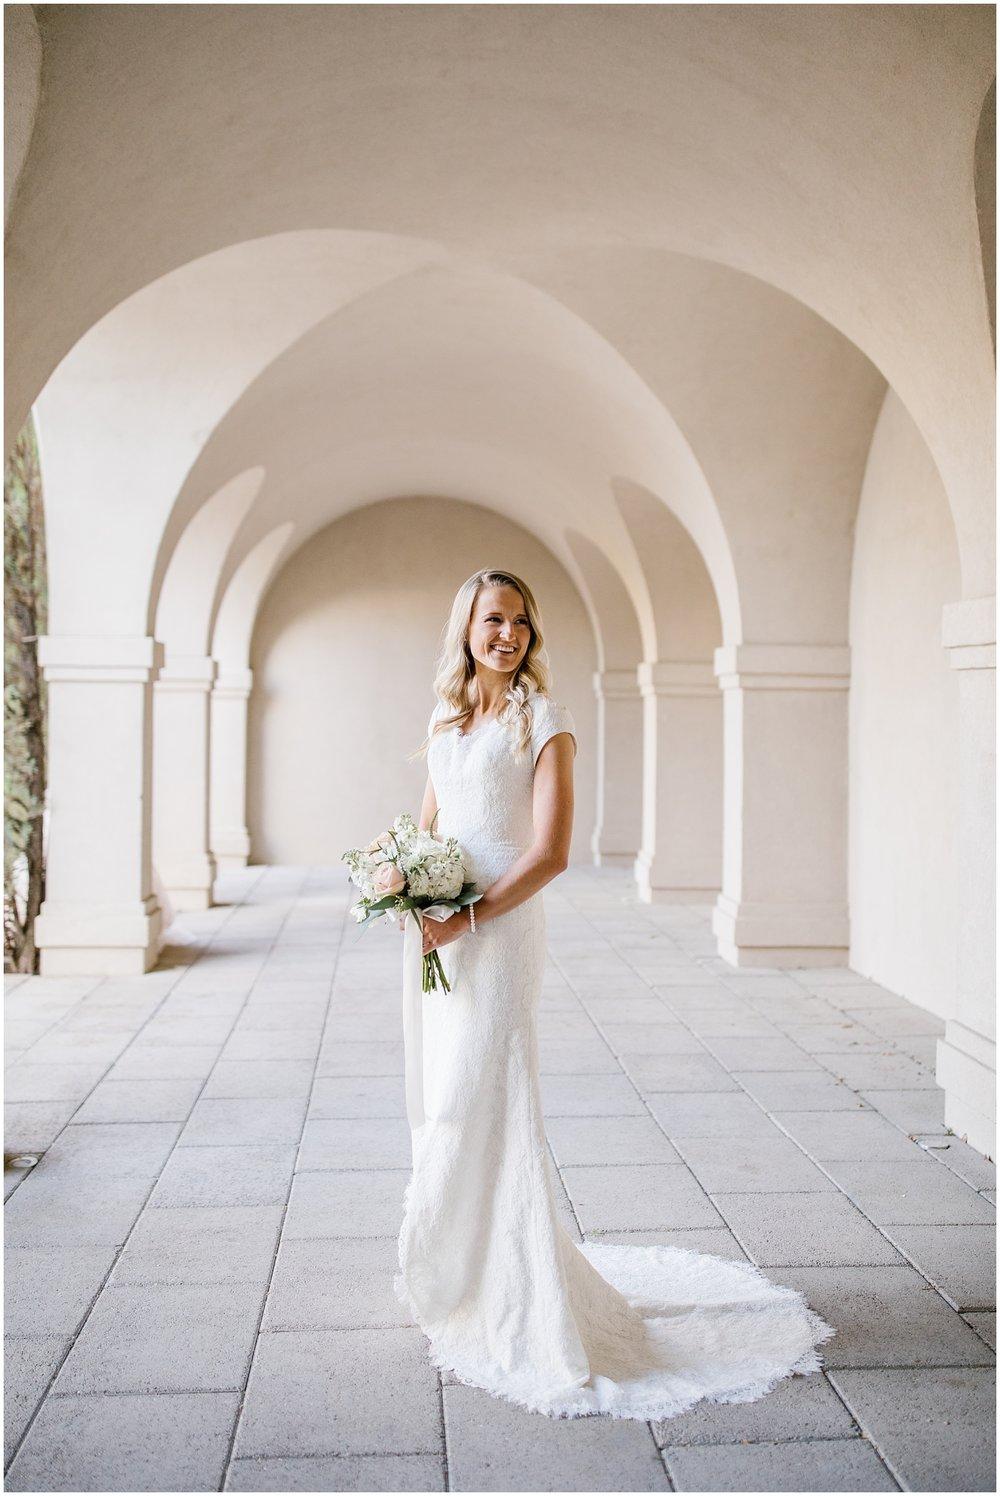 TA-Bridals-23_Lizzie-B-Imagery-Utah-Wedding-Photographer-Park-City-Salt-Lake-City-Thanksgiving-Point-Ashton-Gardens-Lehi-Utah.jpg